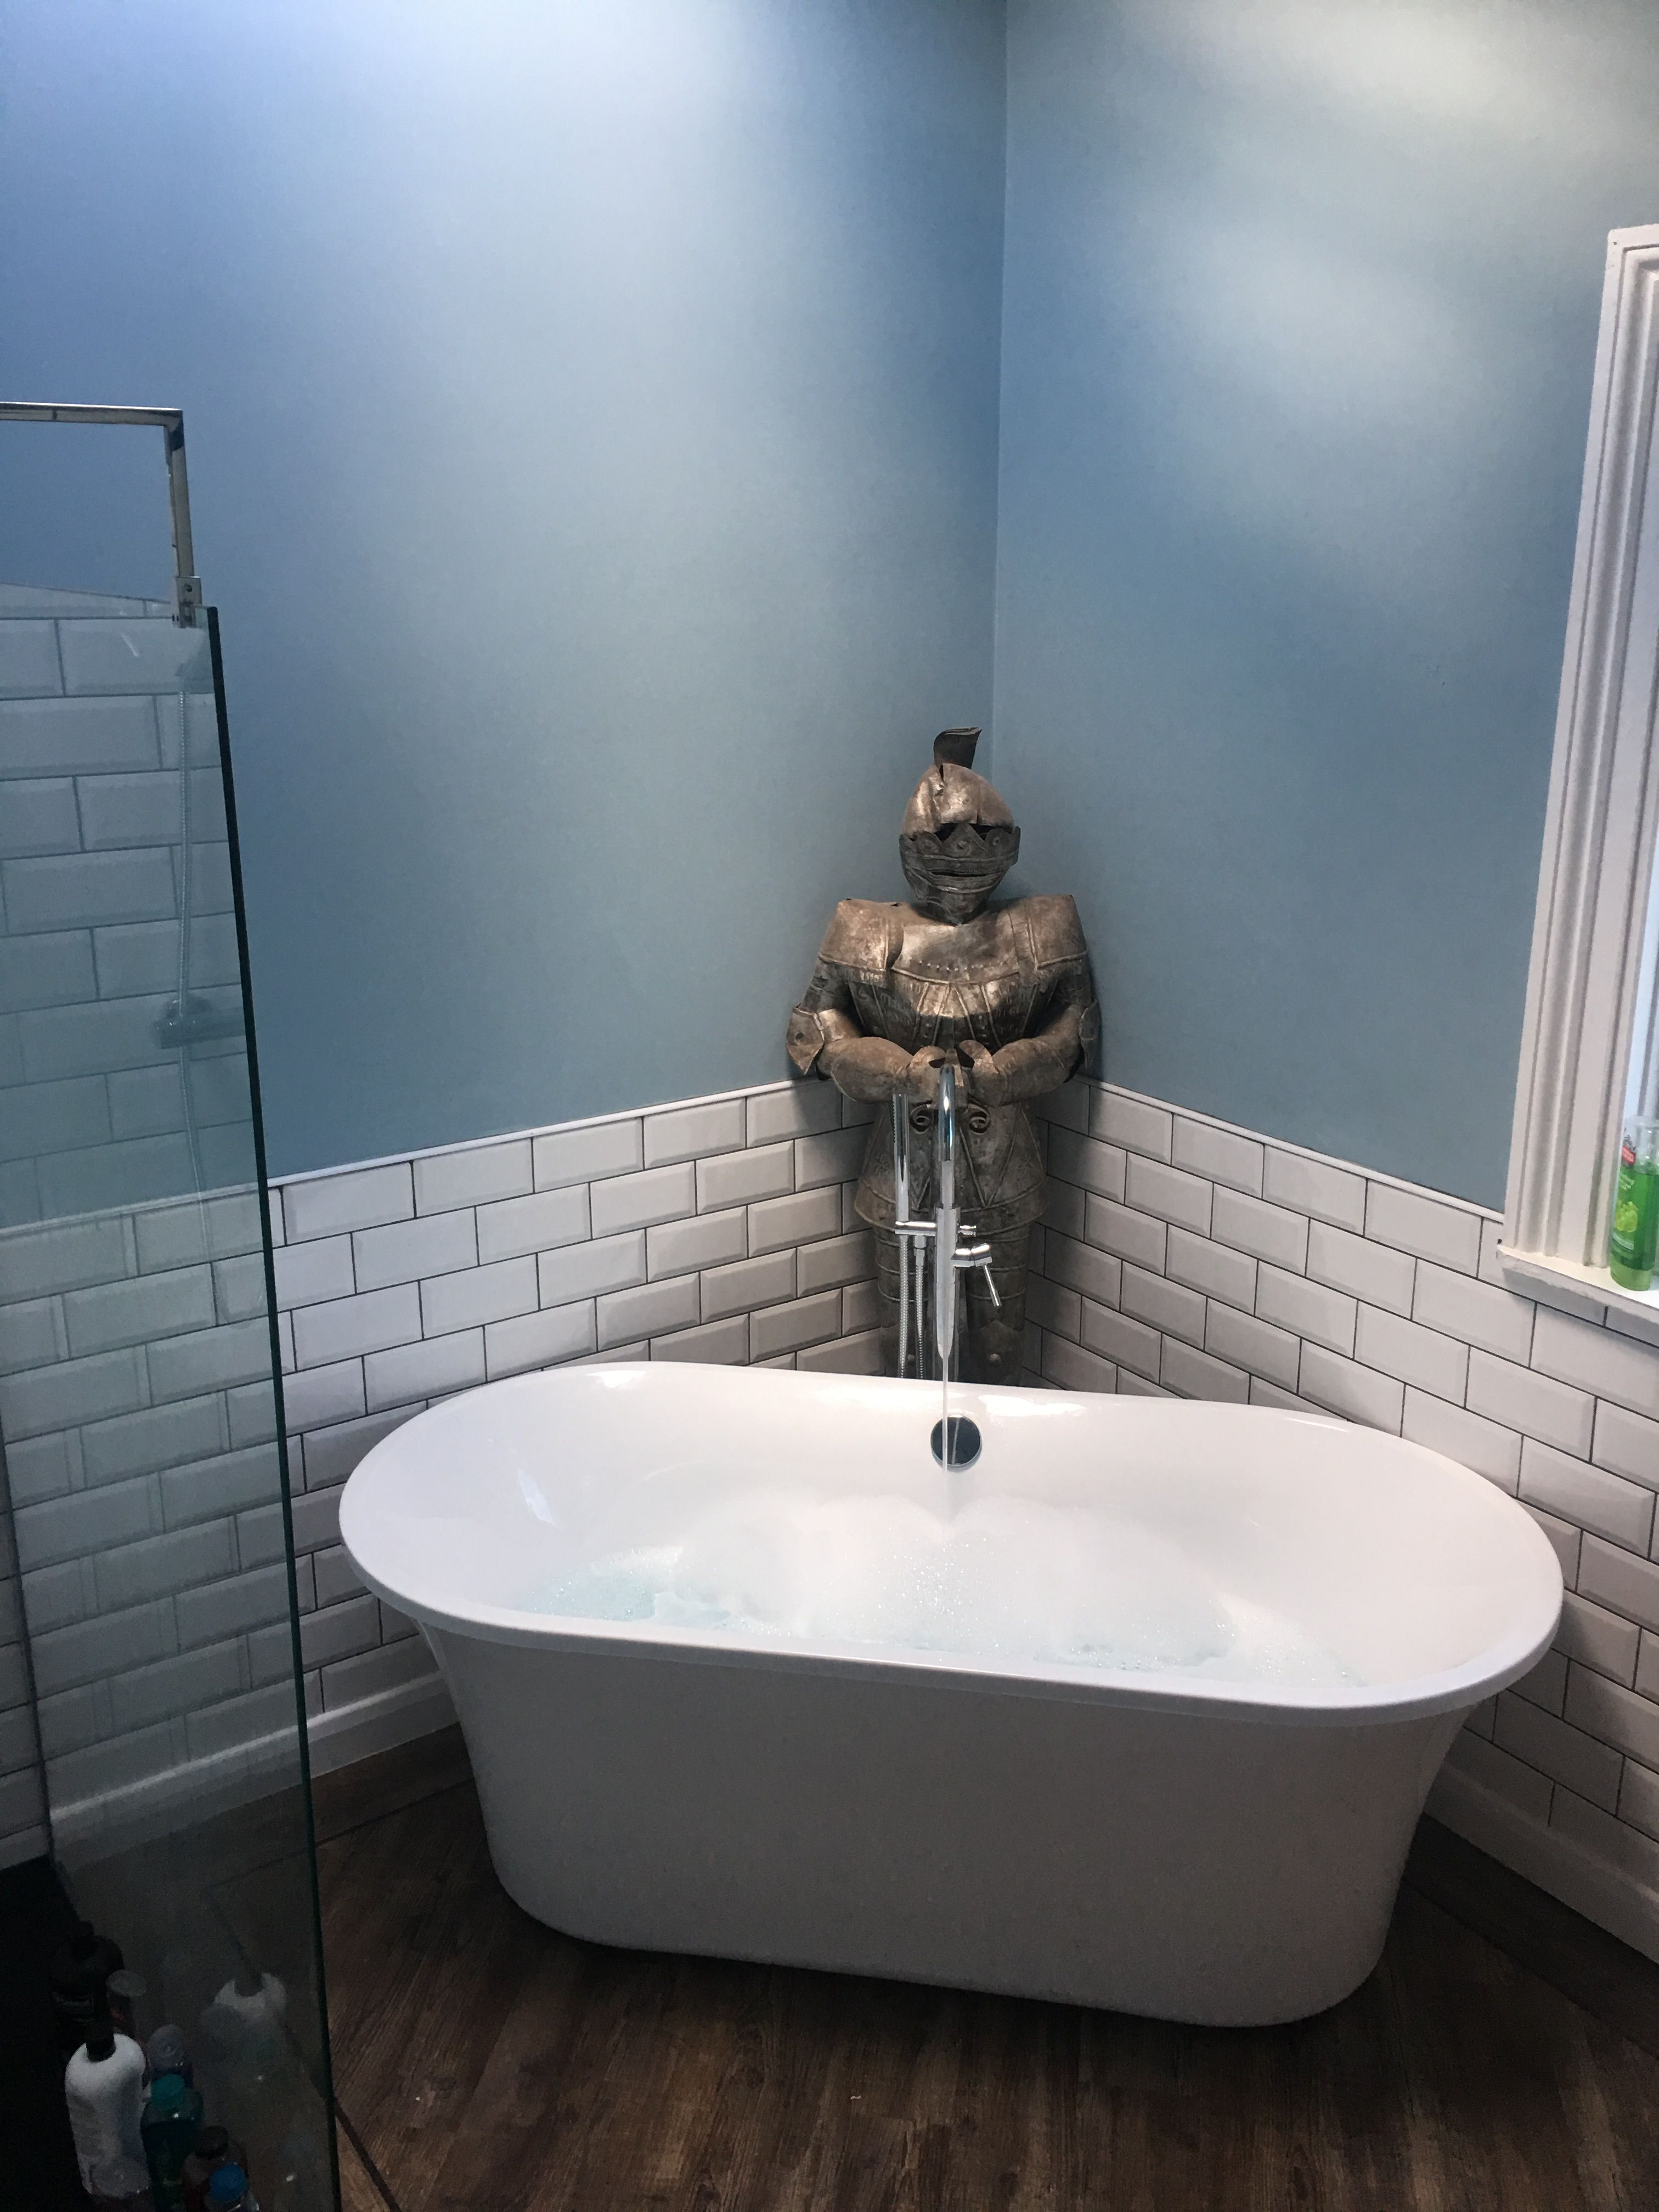 My new bathroom freestandingbath knight My new